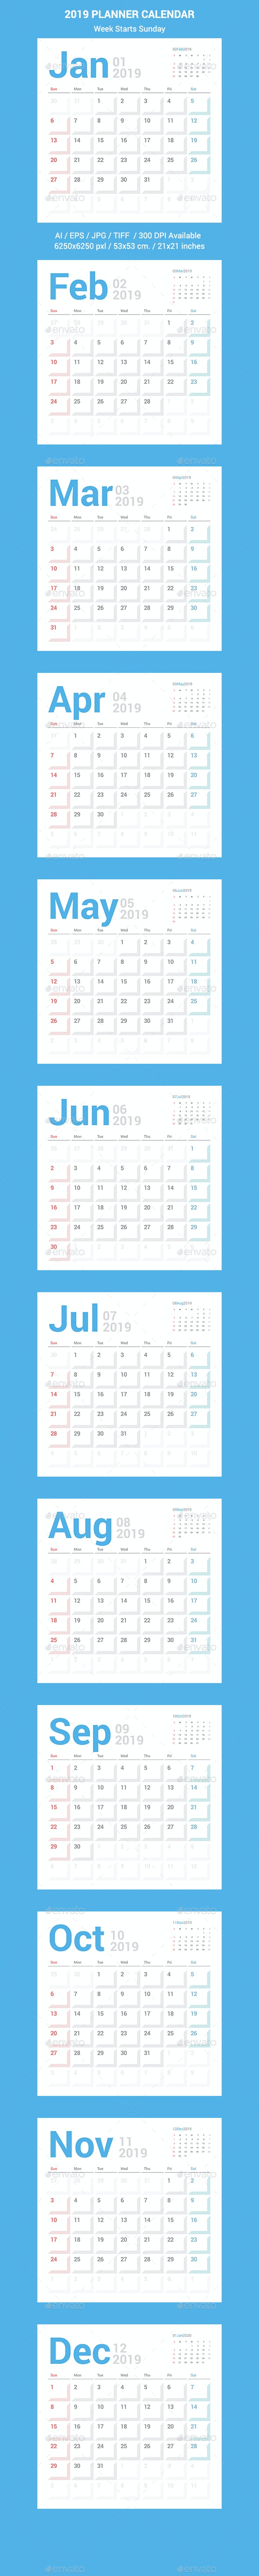 Calendar Planner Design. Week Starts Sunday. - Calendars Stationery